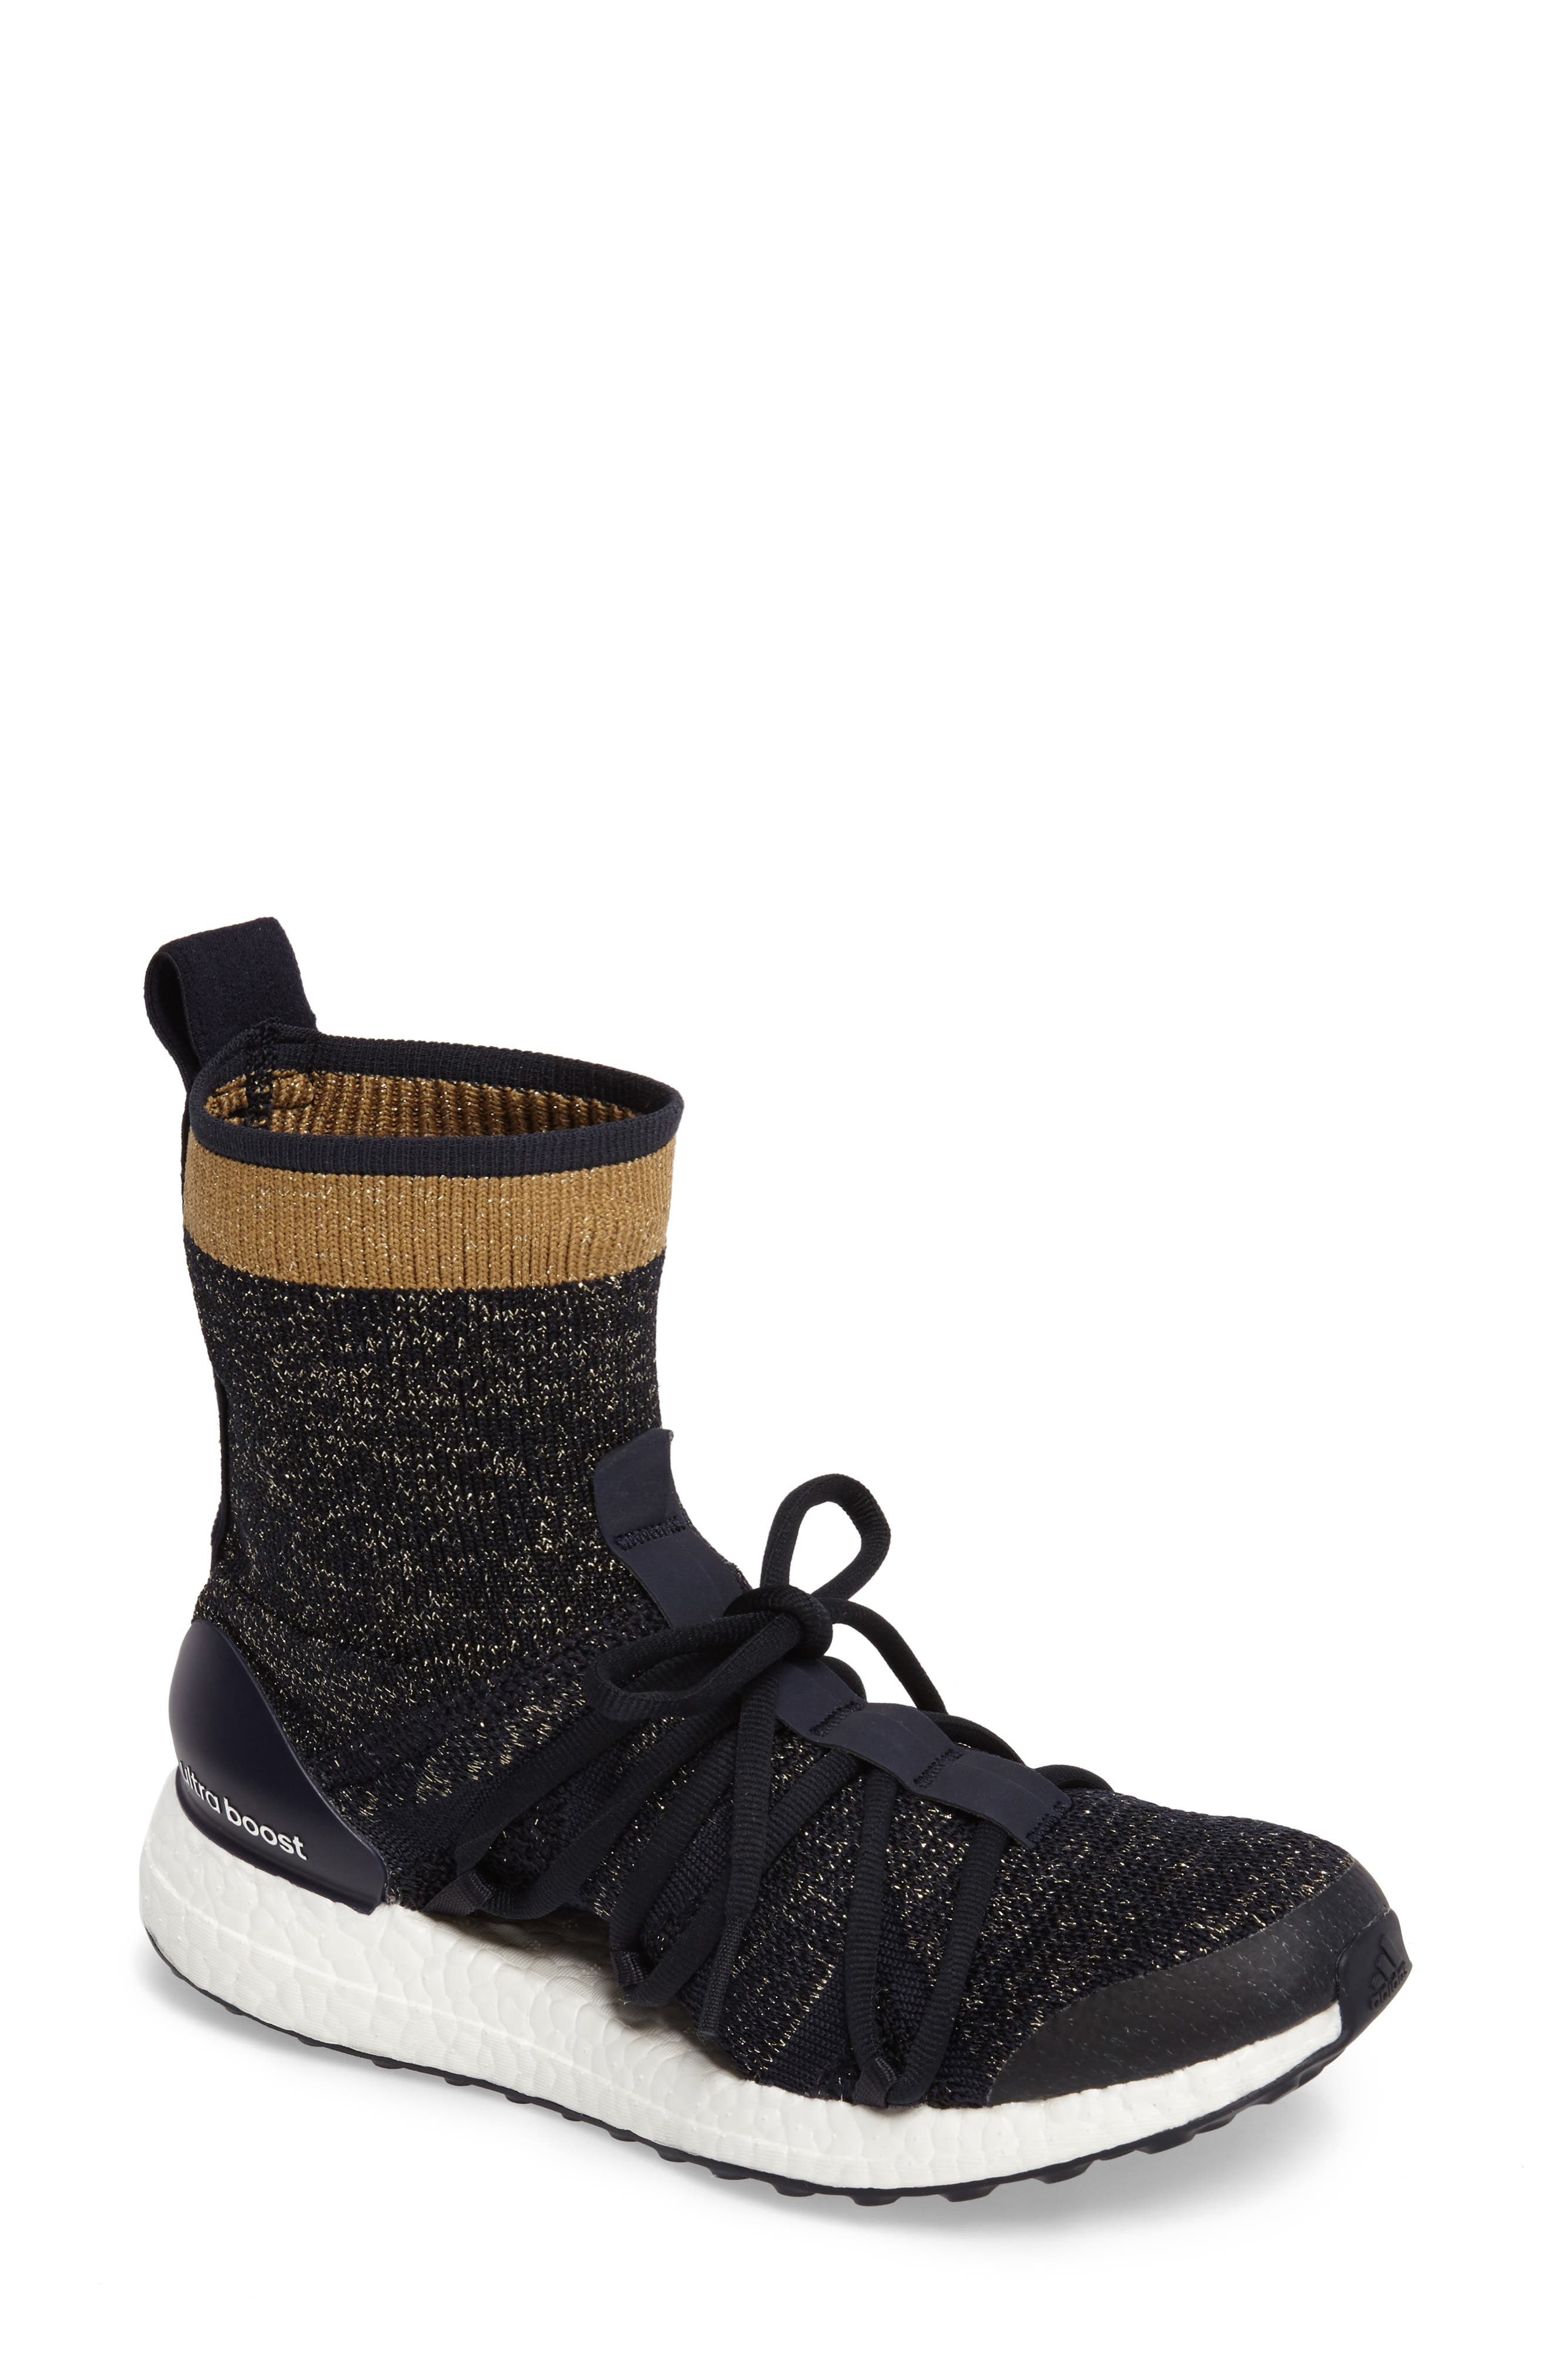 by Stella McCartney UltraBoost X Primeknit Mid Sneaker,                             Main thumbnail 1, color,                             400